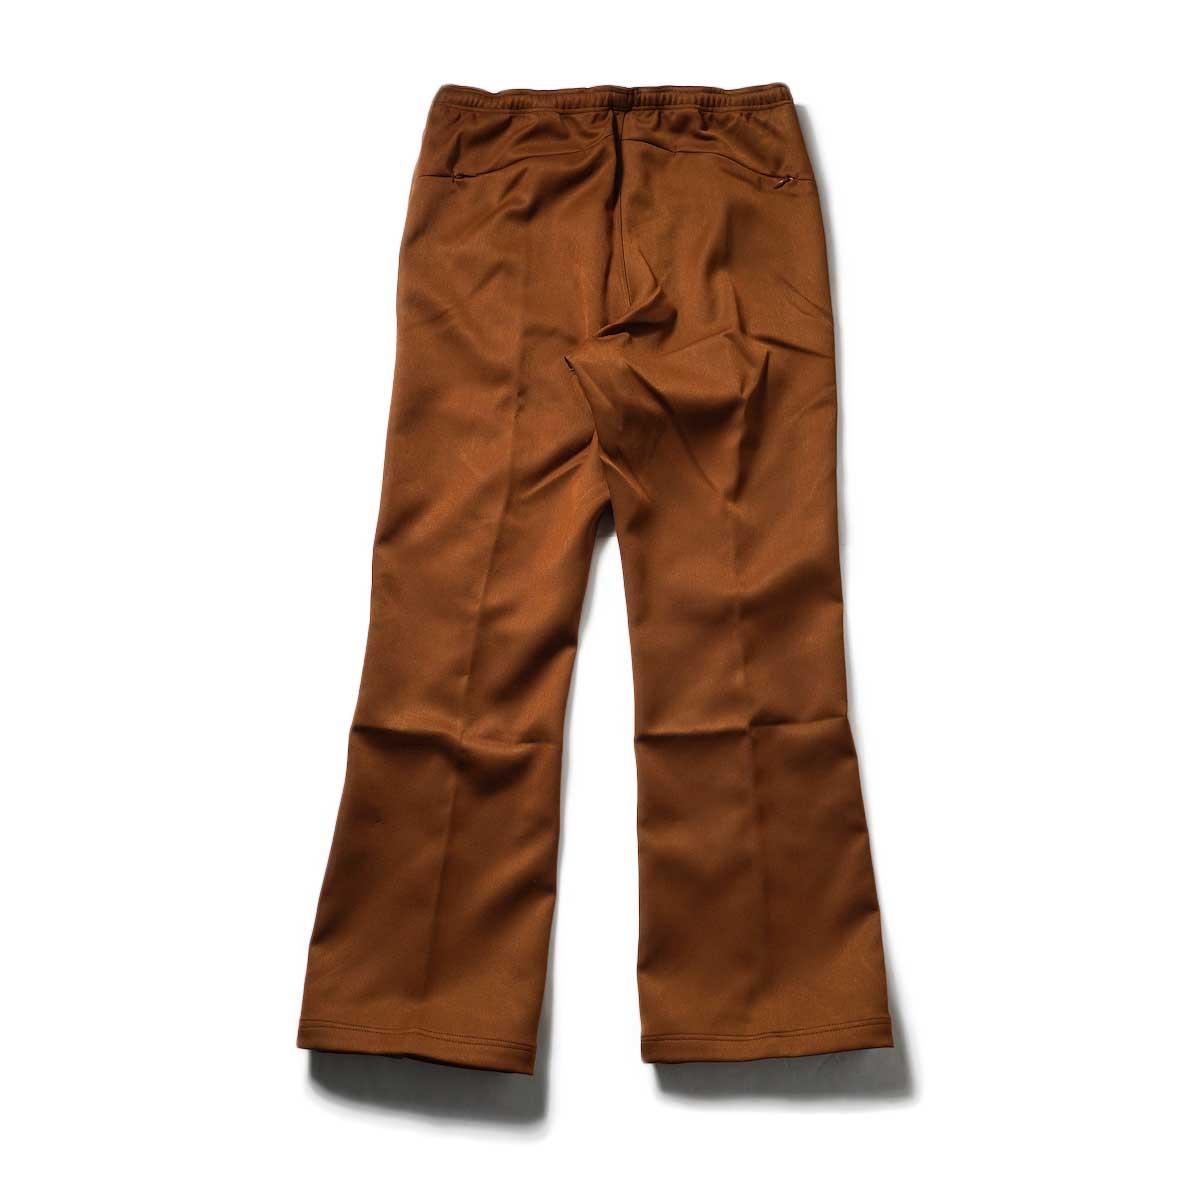 Needles / W.U. BOOT-CUT PANT - PE/R DOESKIN (Brown)背面